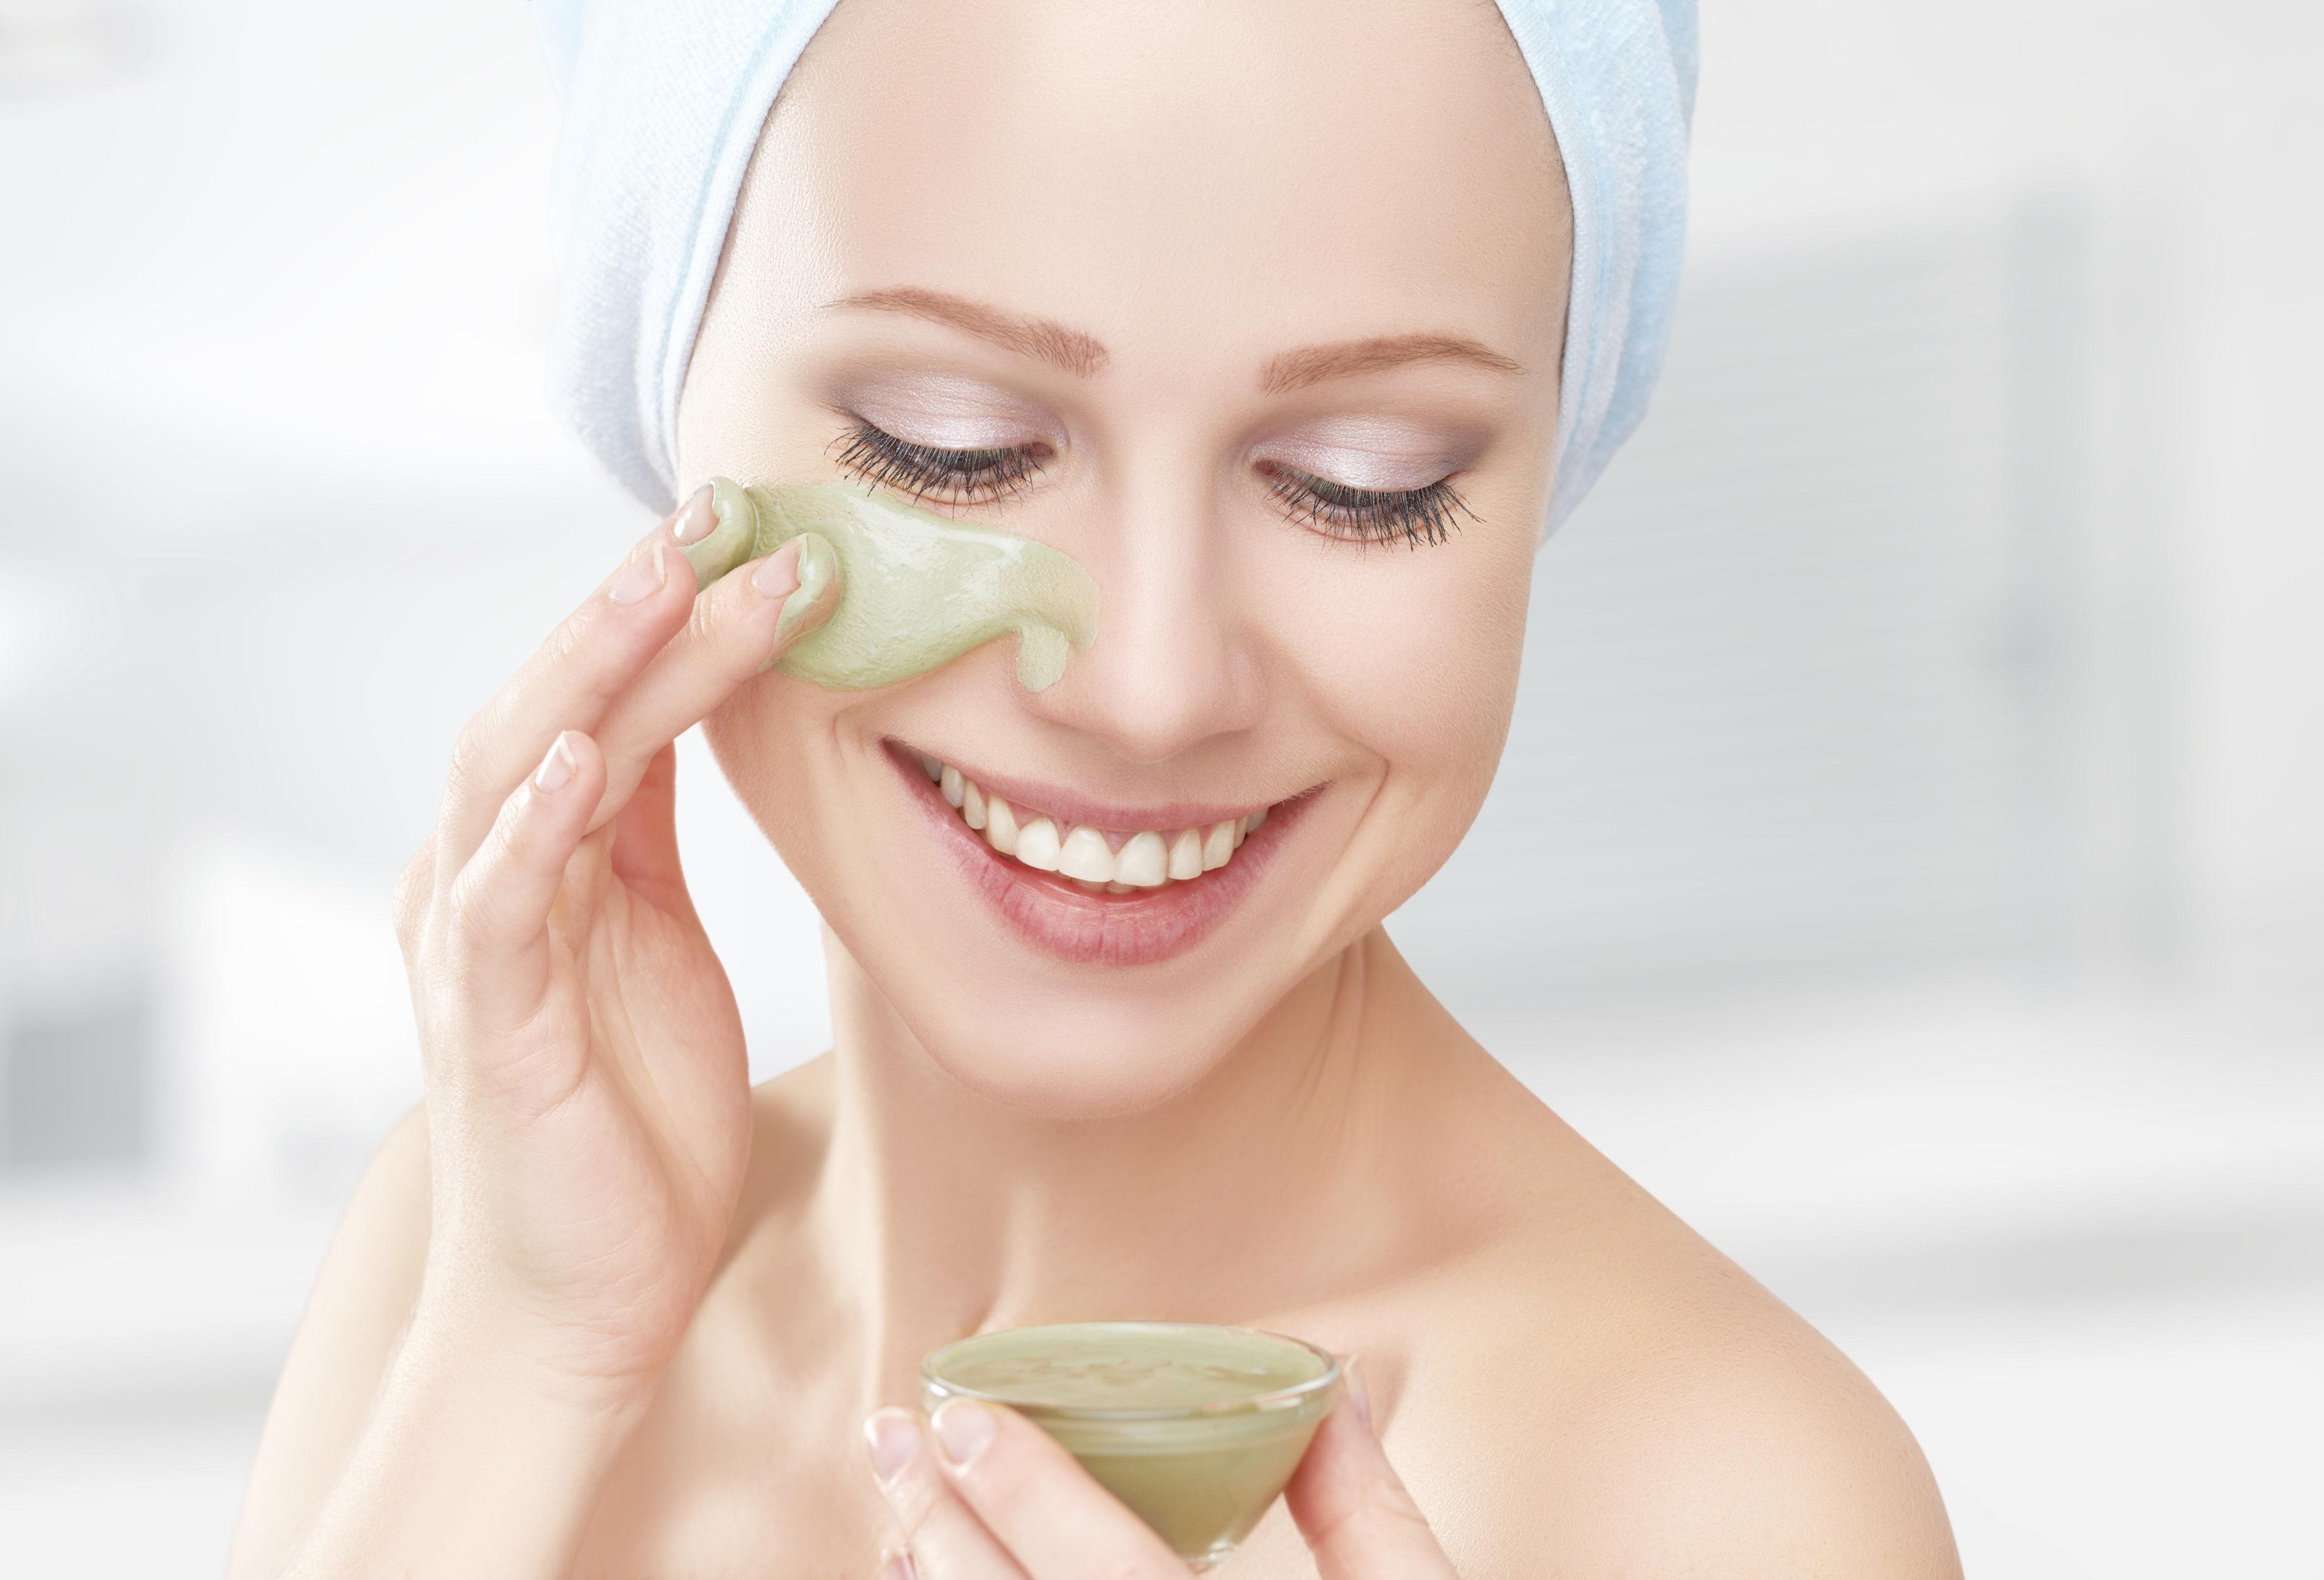 facial masks for women